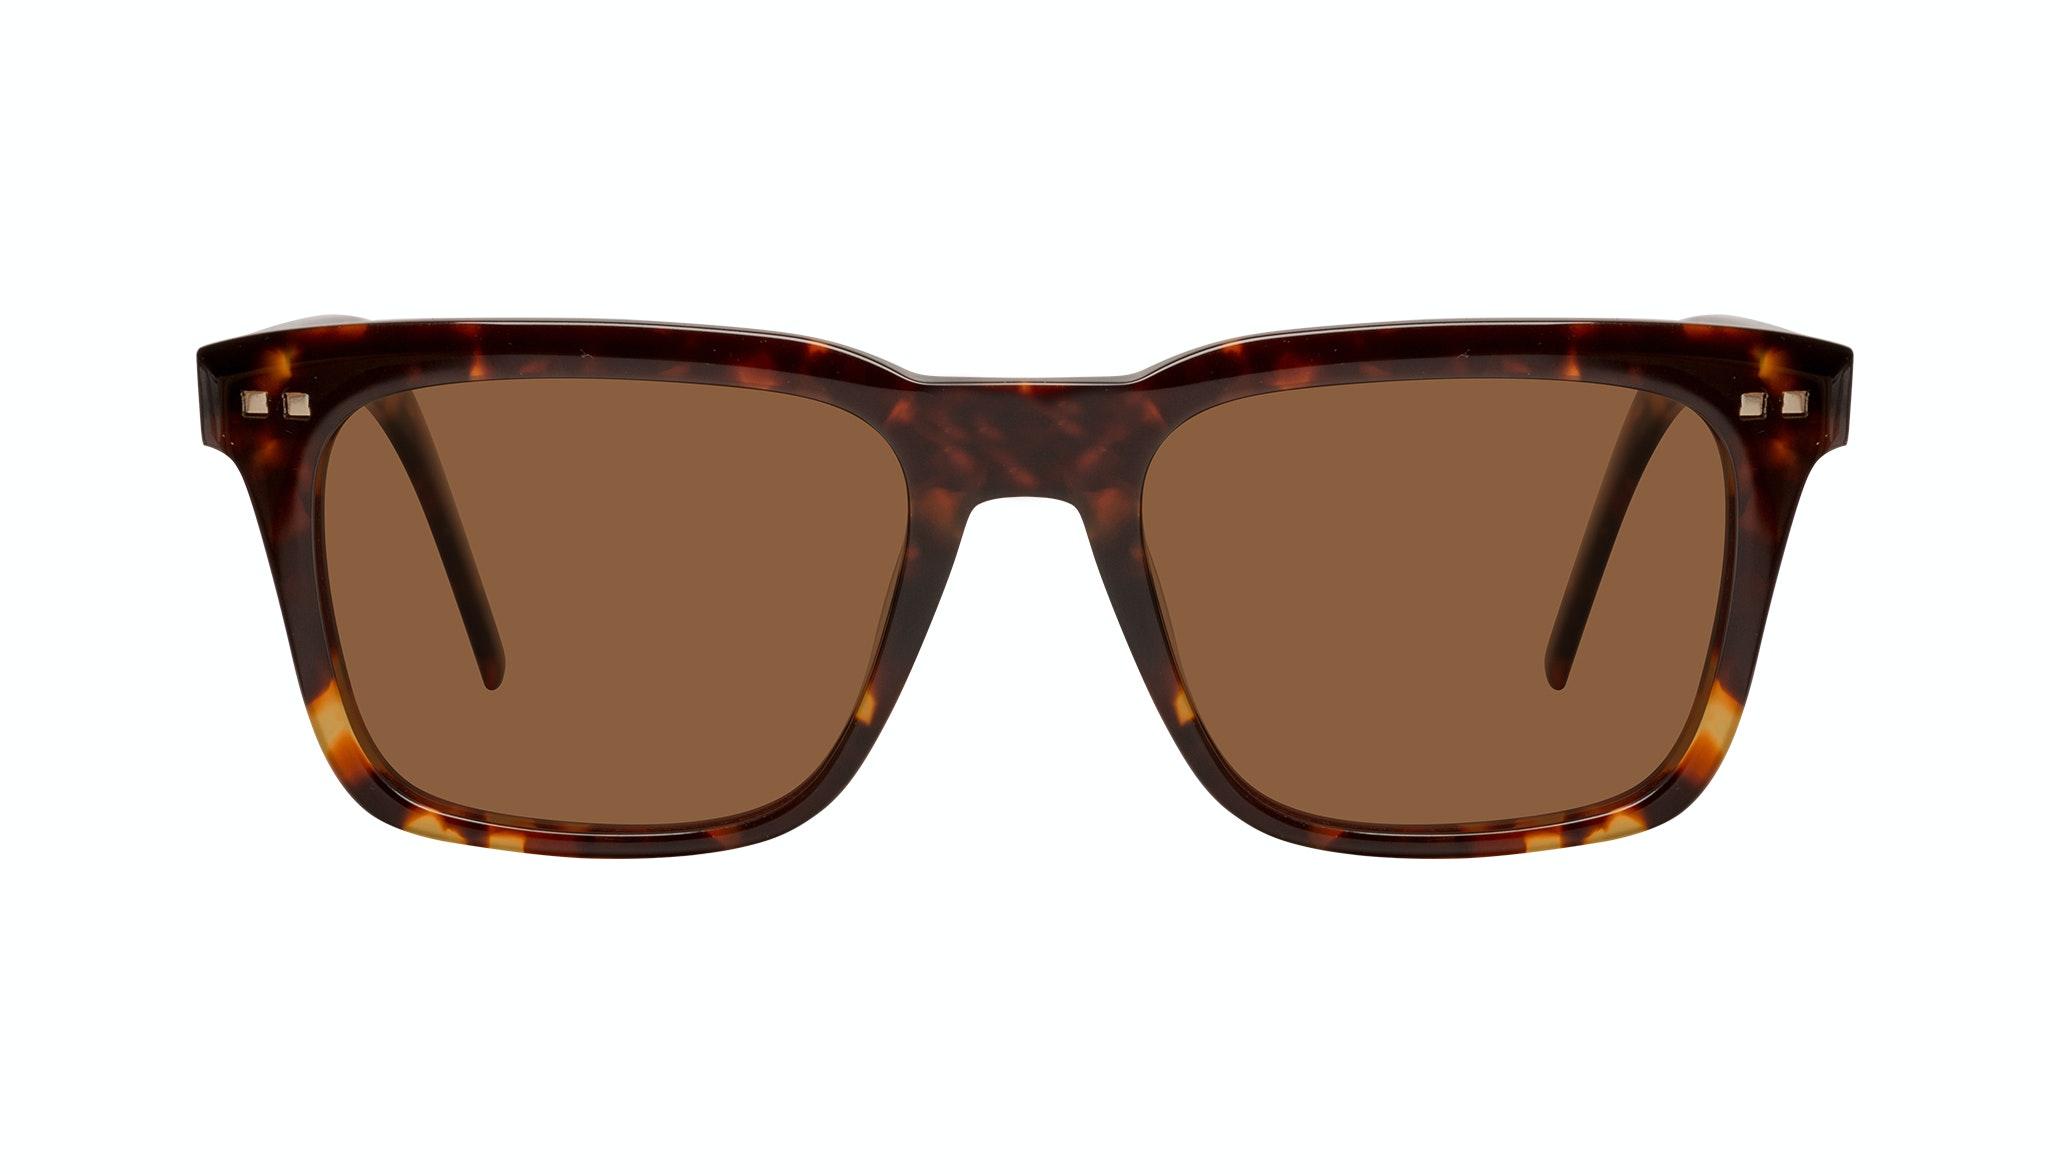 Affordable Fashion Glasses Square Sunglasses Men Well Tortoise Front